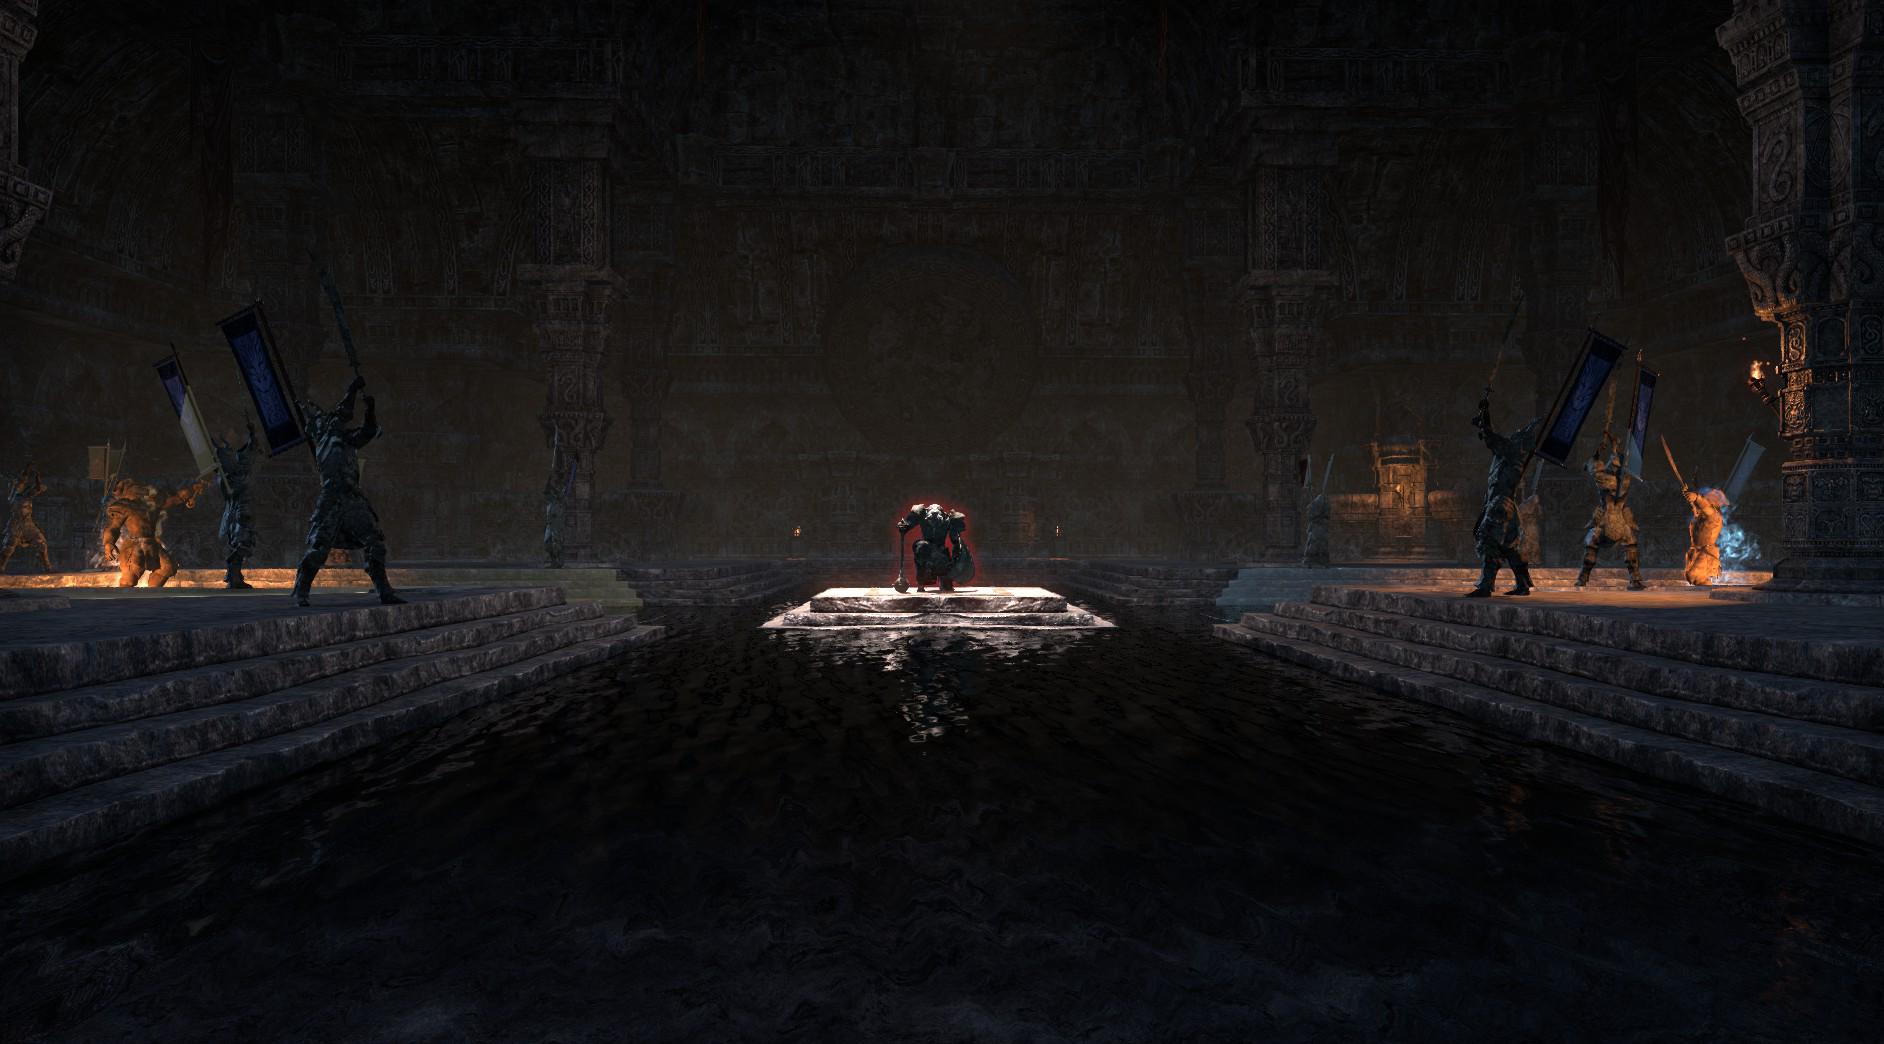 Assaulting the Citadel